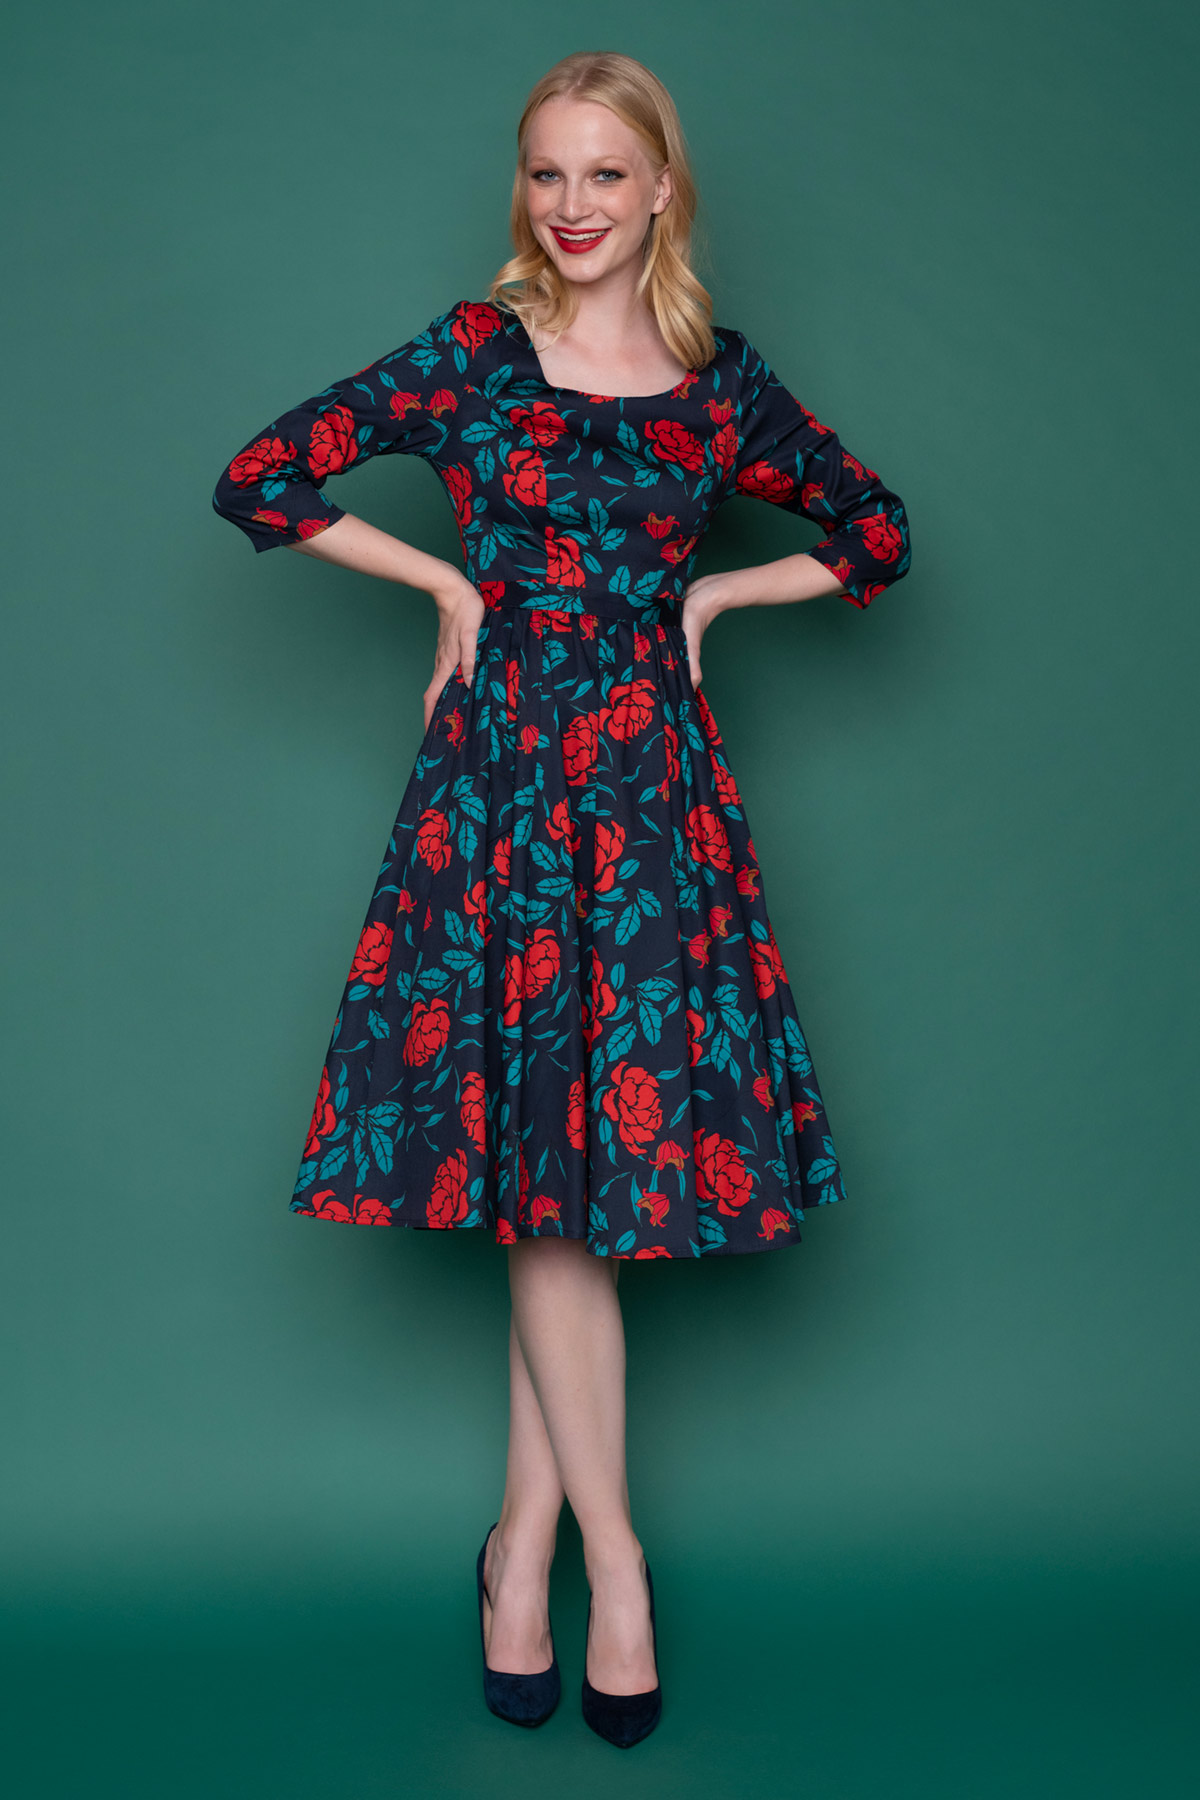 Navy μπλε vintage φόρεμα με 3/4 μανίκια σε μίντι μήκος, με ασορτί ζώνη,στρογγυλή λαιμουδιά και φούστα με σούρα μέχρι το γόνατο για ένα εντυπωσιακό 50s look!